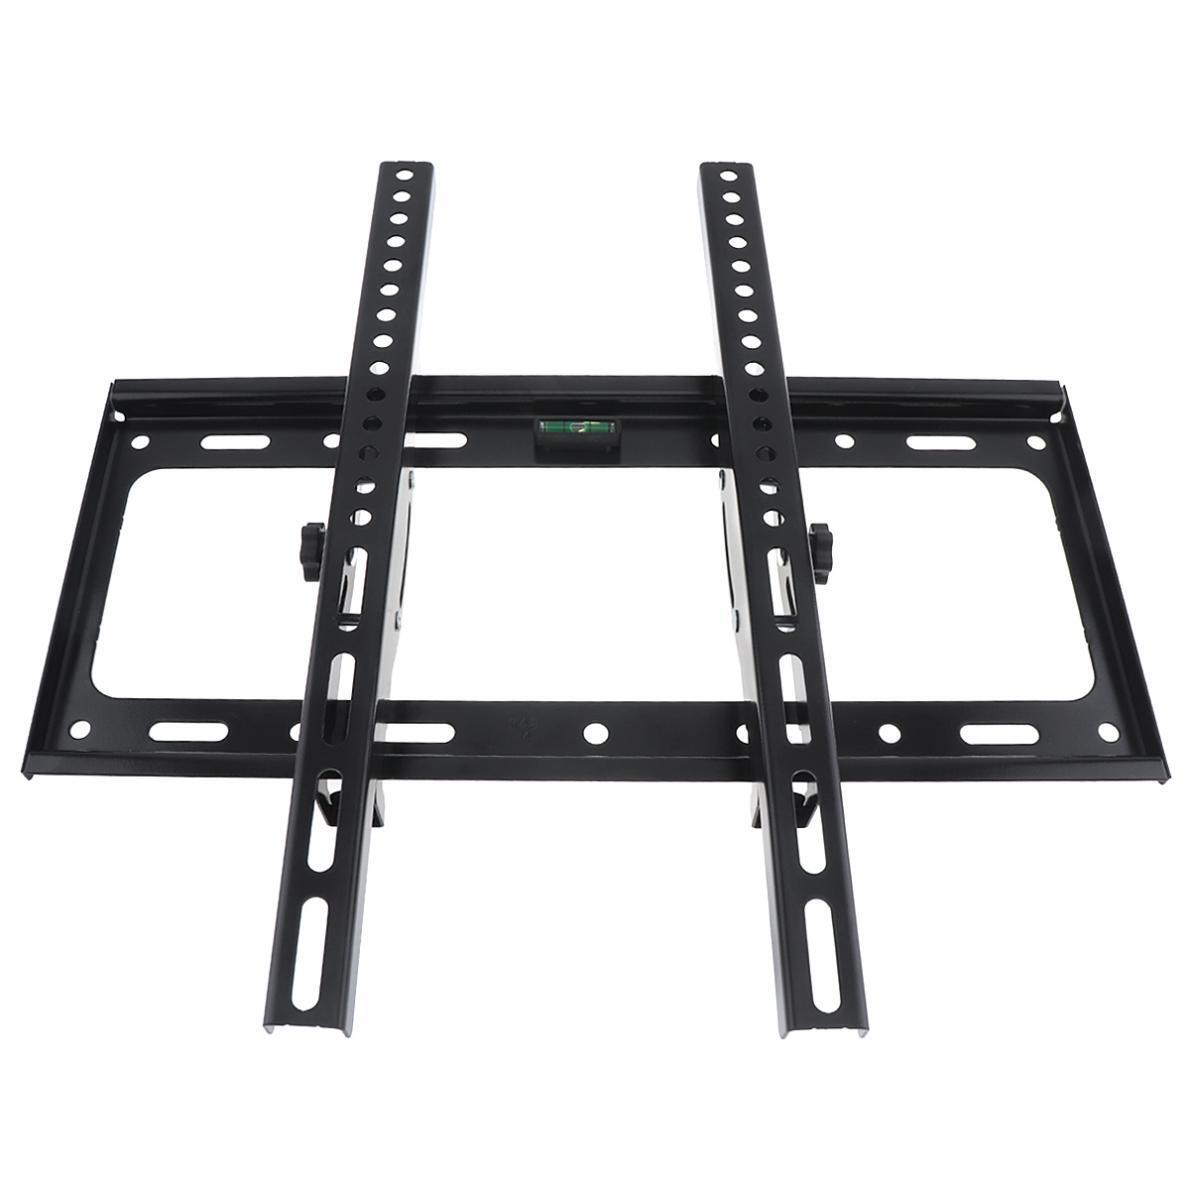 50KG Adjustable 26 - 52 Inch TV Wall Mount Bracket Flat Panel TV Frame Support 15 Degrees Tilt for LCD LED Monitor Flat Pan